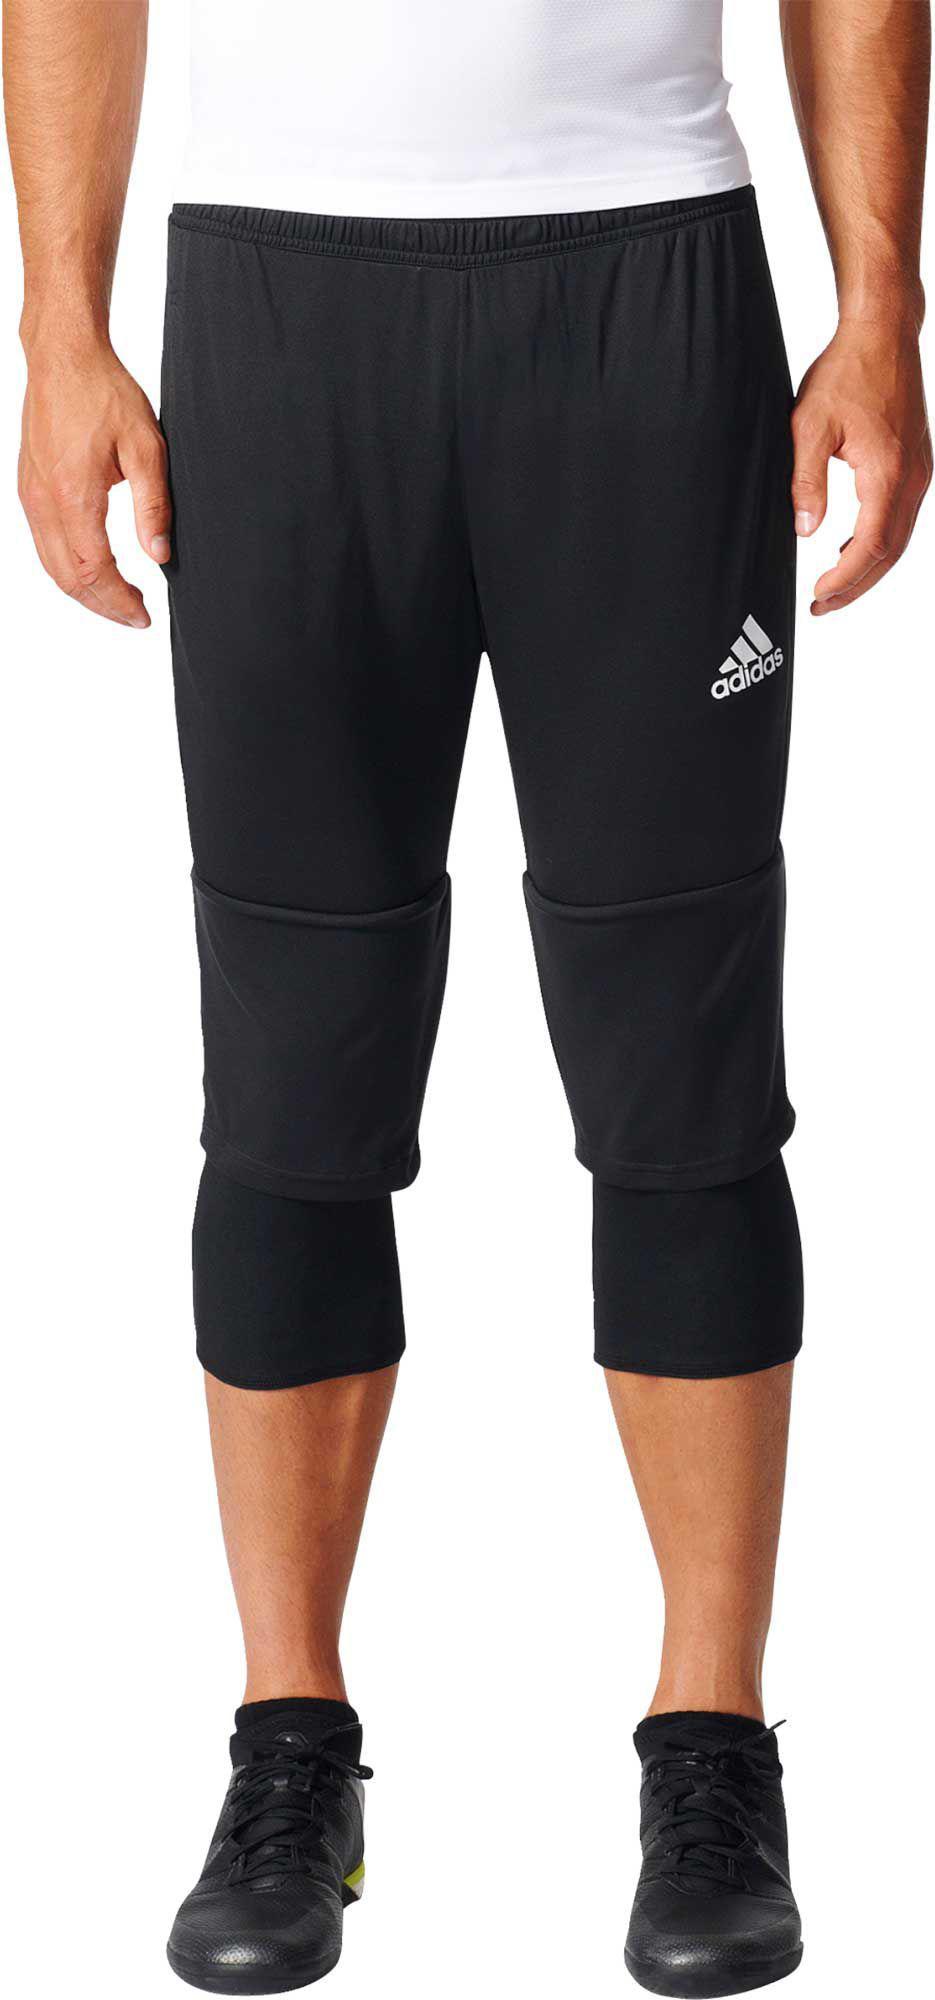 ae2a13322bbe Lyst - adidas Tiro 17 Three-quarter Pants in Black for Men